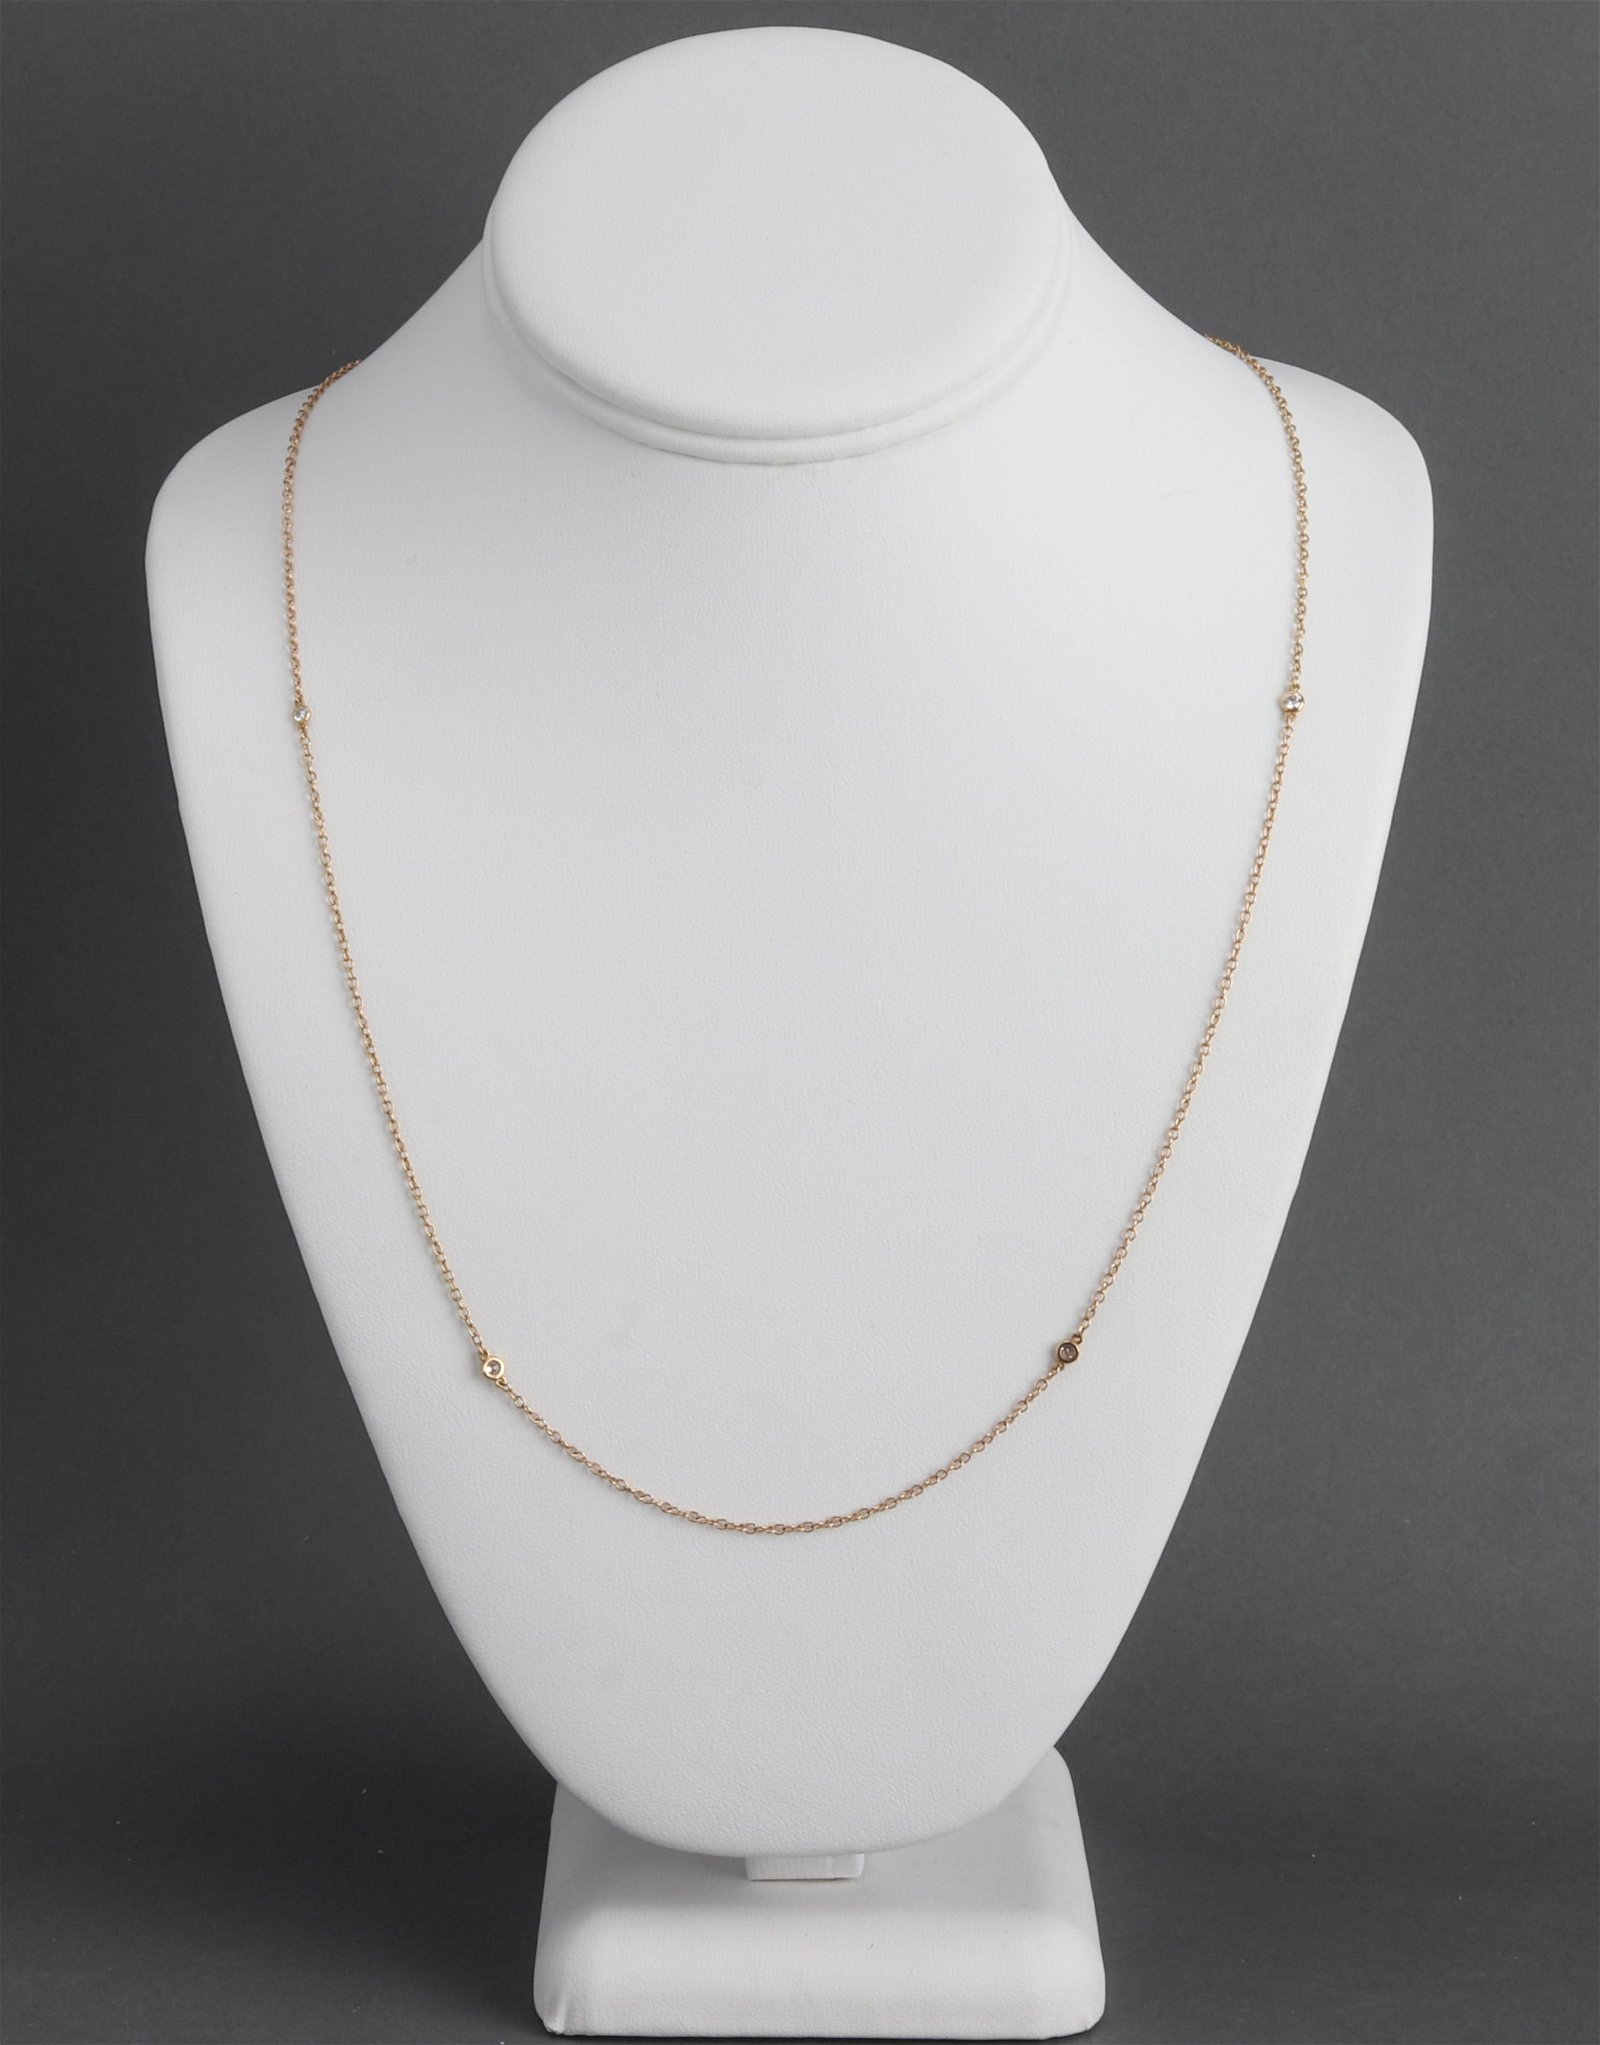 Tiffany & Co. 18K Yellow Gold & Diamond Necklace